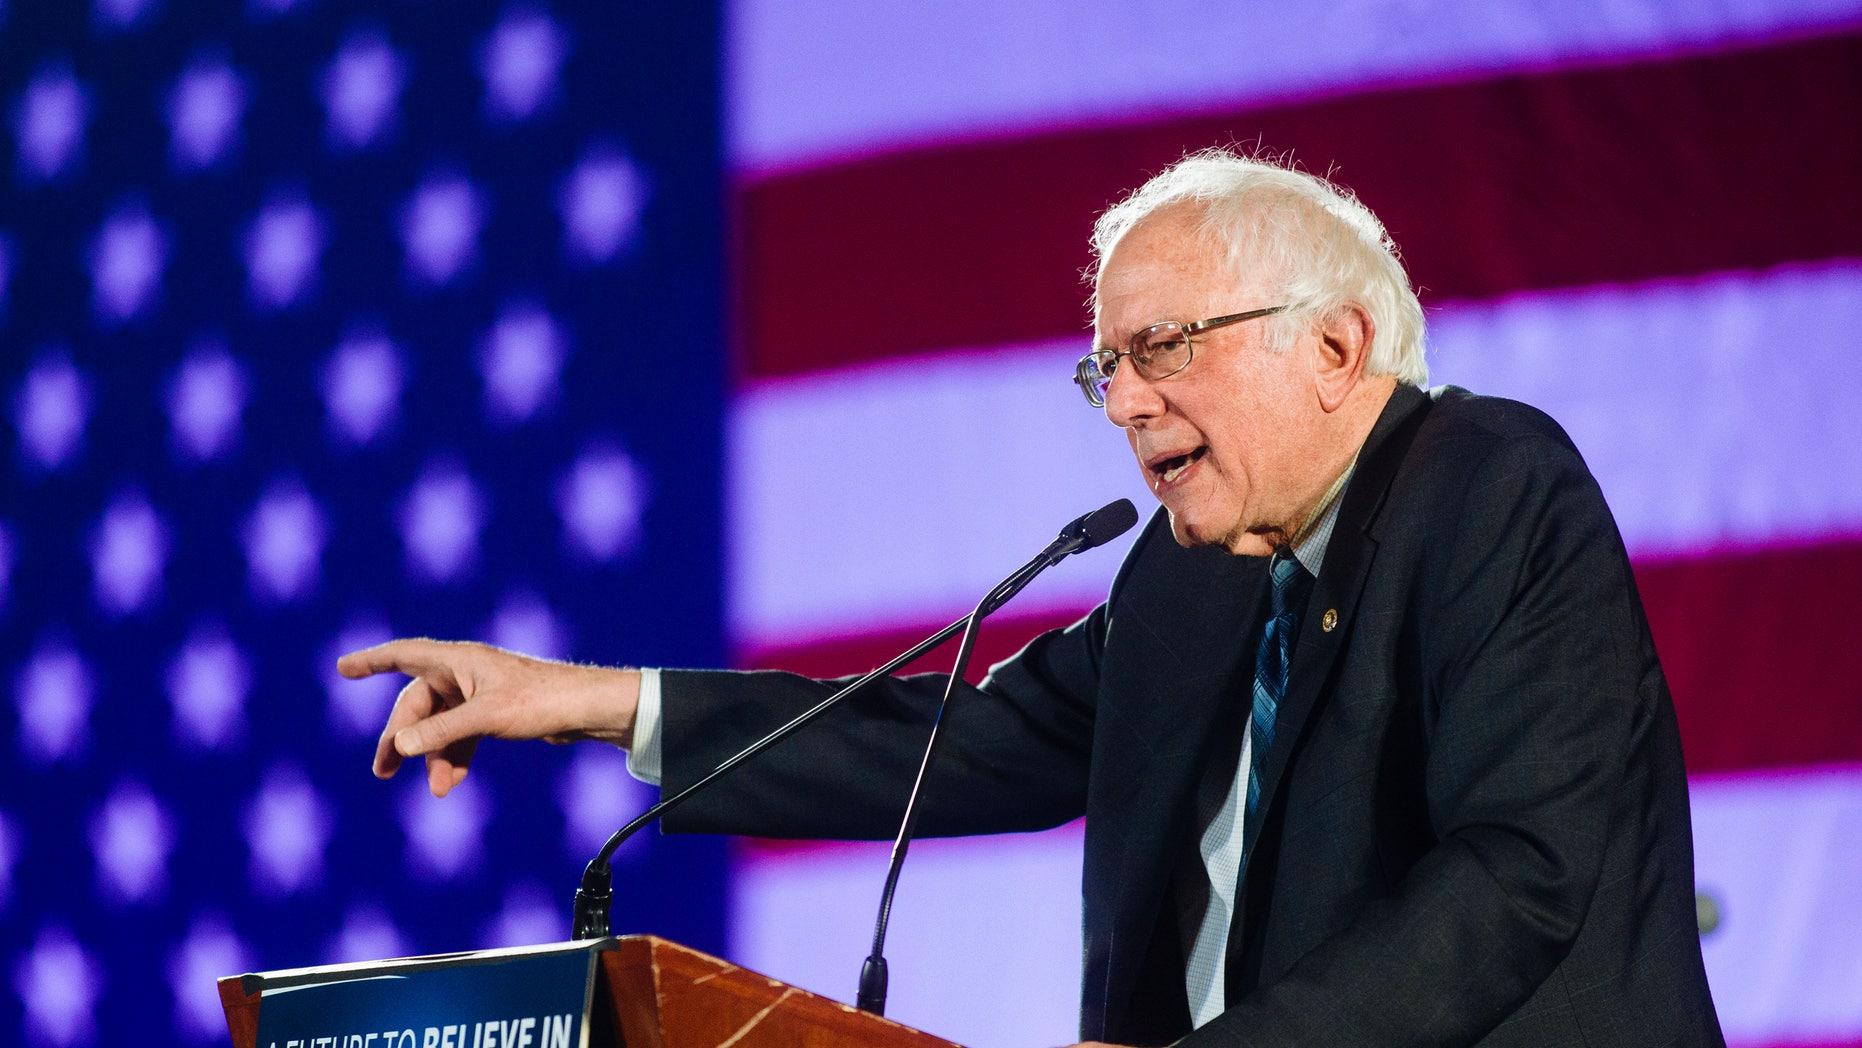 Sanders at the Tropicana Hotel in Las Vegas on Wednesday, Jan. 6, 2016.